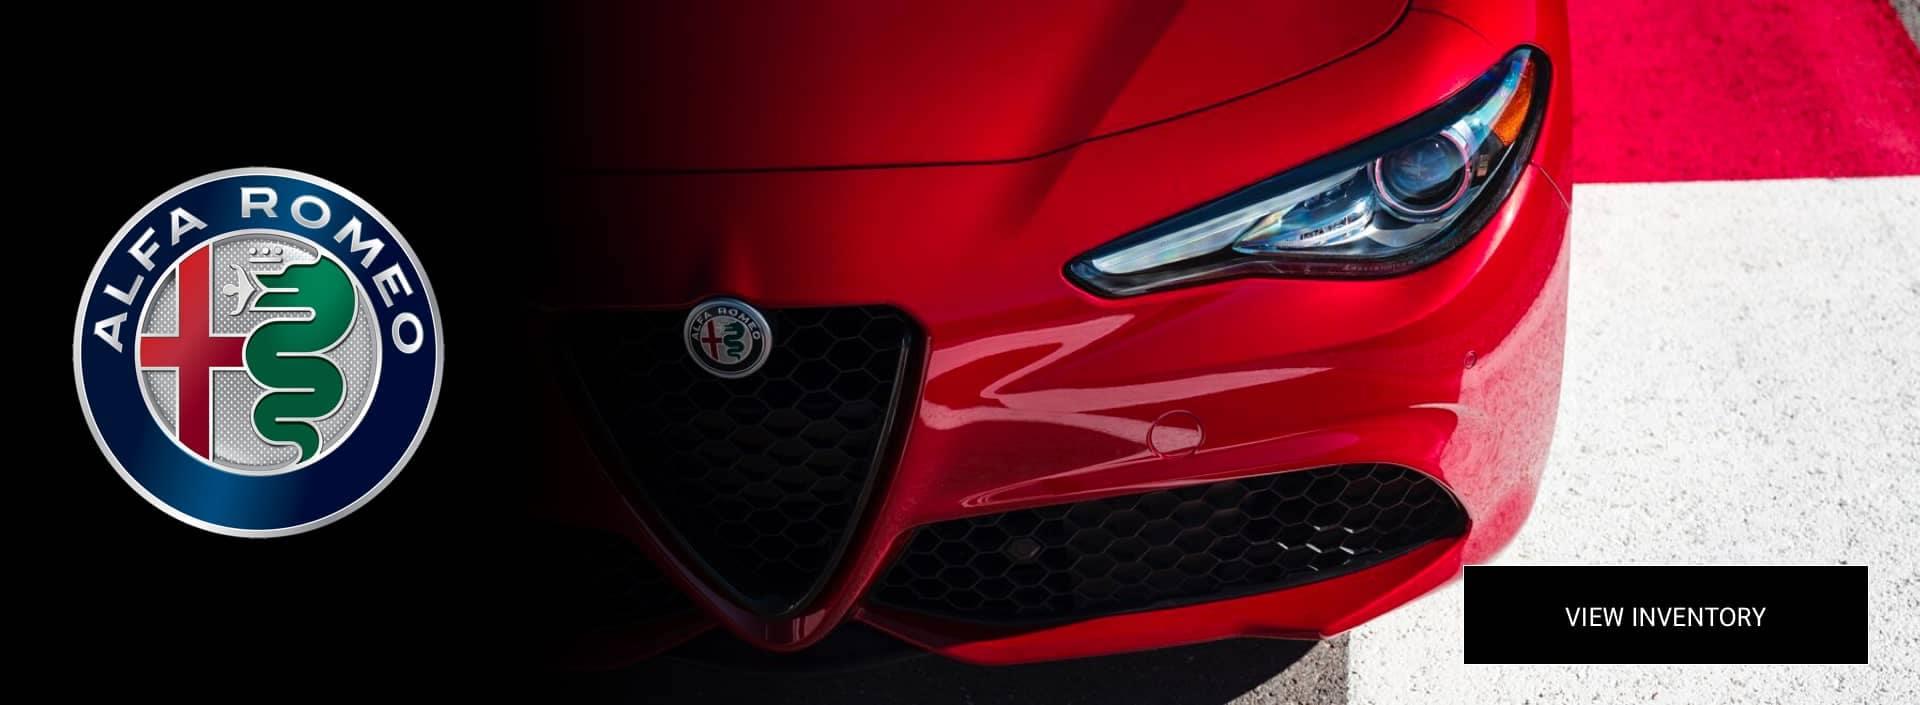 Alfa Romeo New Inventory banner